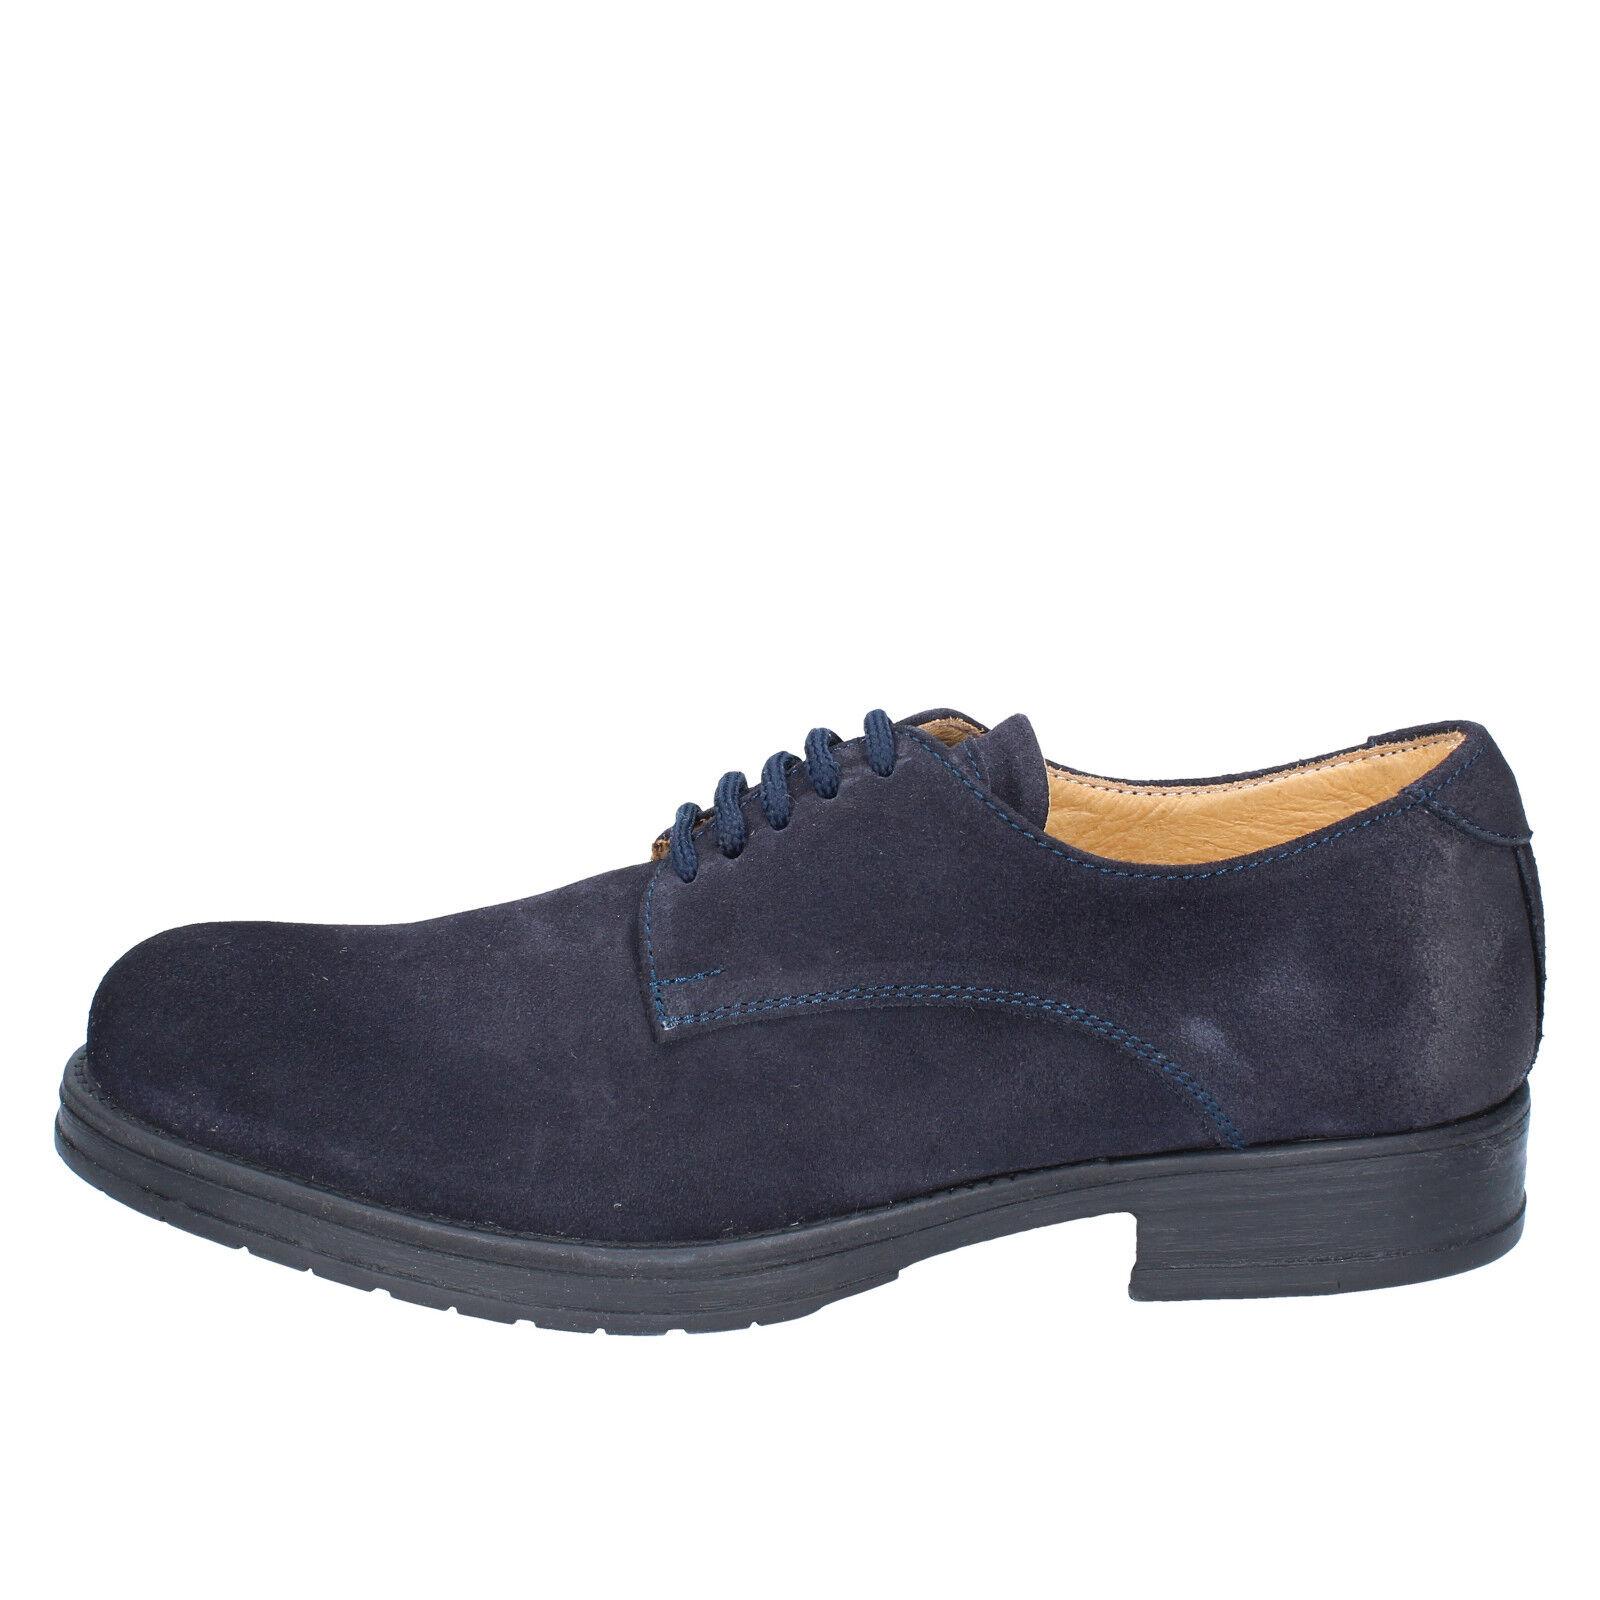 Herren schuhe SALVO BARONE wildleder 40 EU elegante blau wildleder BARONE BZ166-B ff60a7